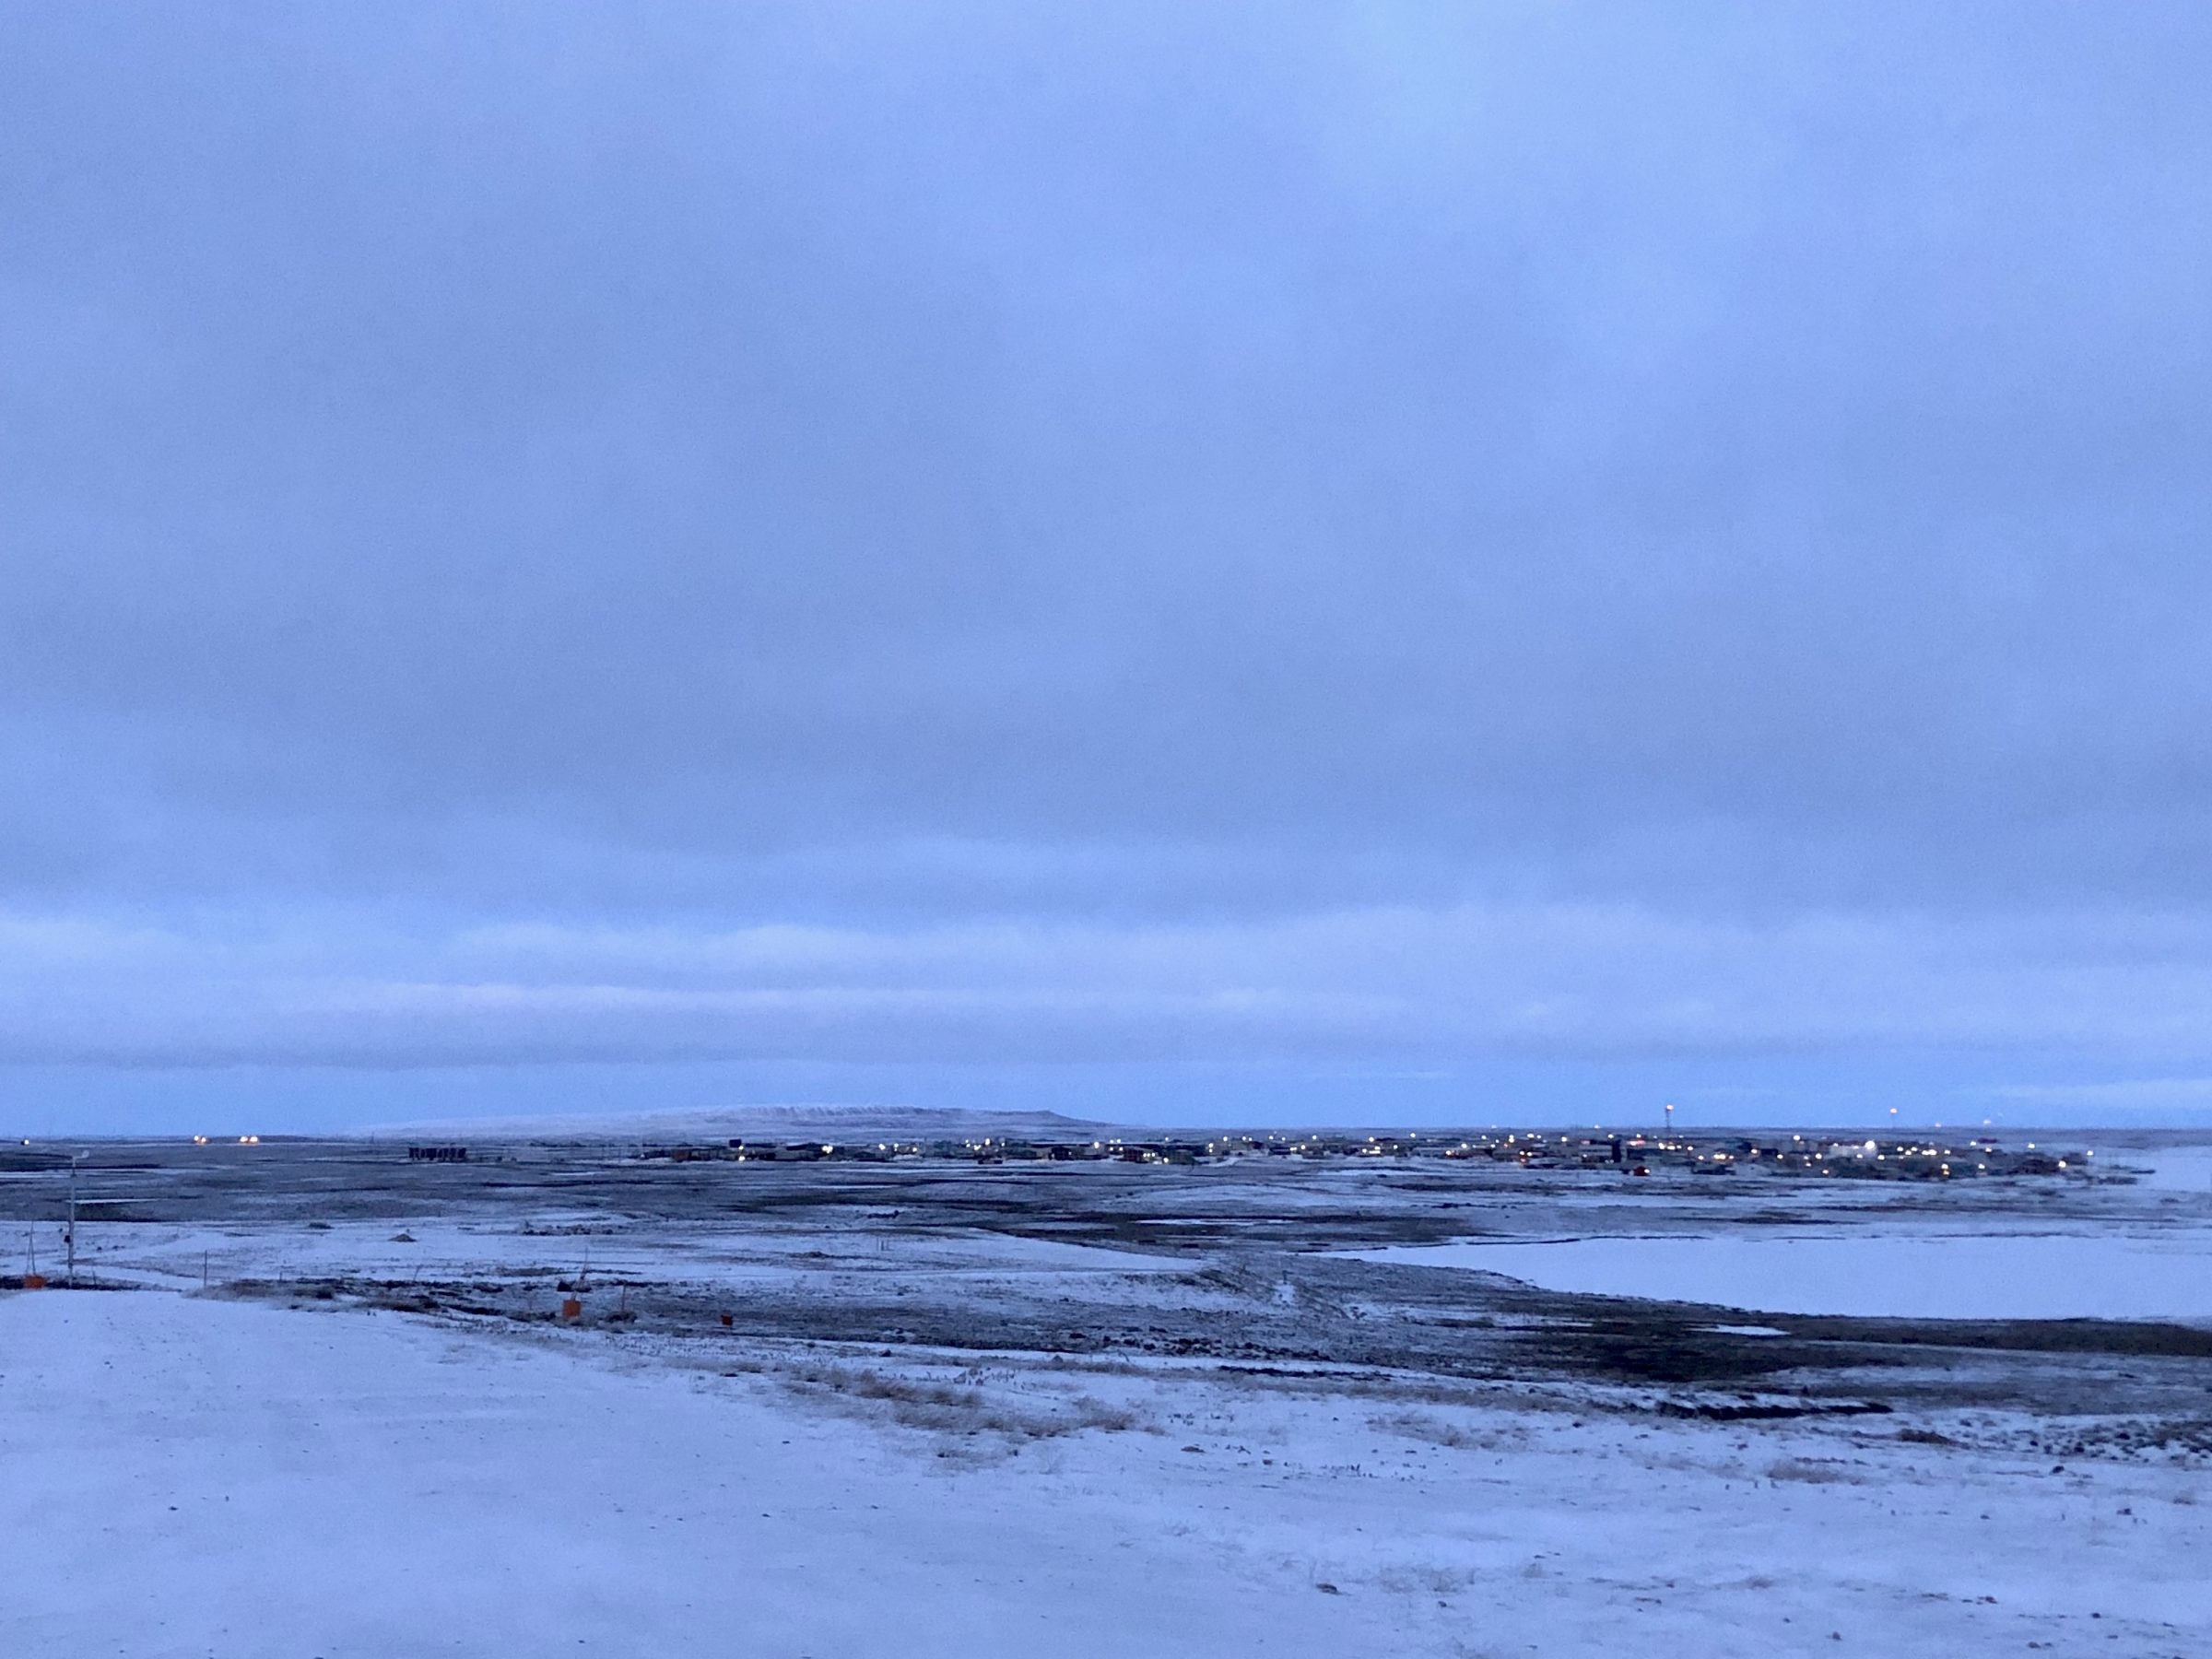 Western Nunavut's hub to test the waters for changing its name | Nunatsiaq News